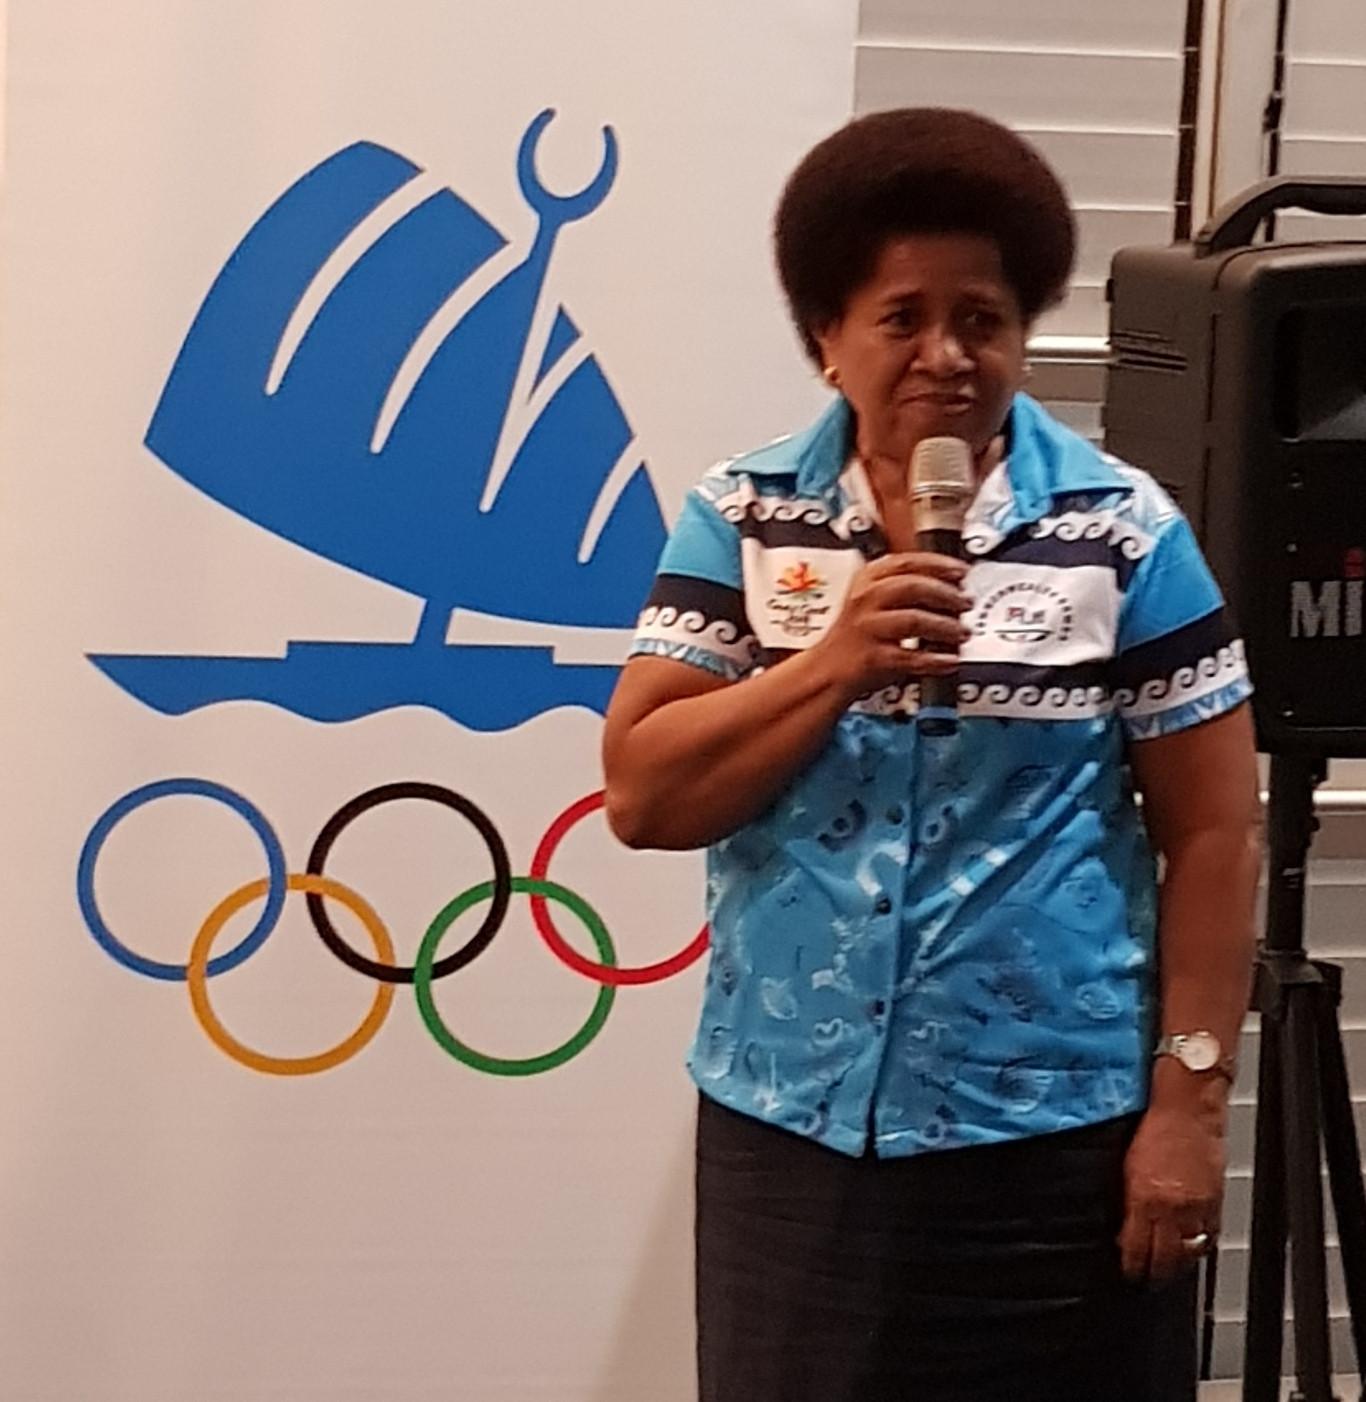 FASANOC elect Lenoa as first indigenous Fijian woman to be President